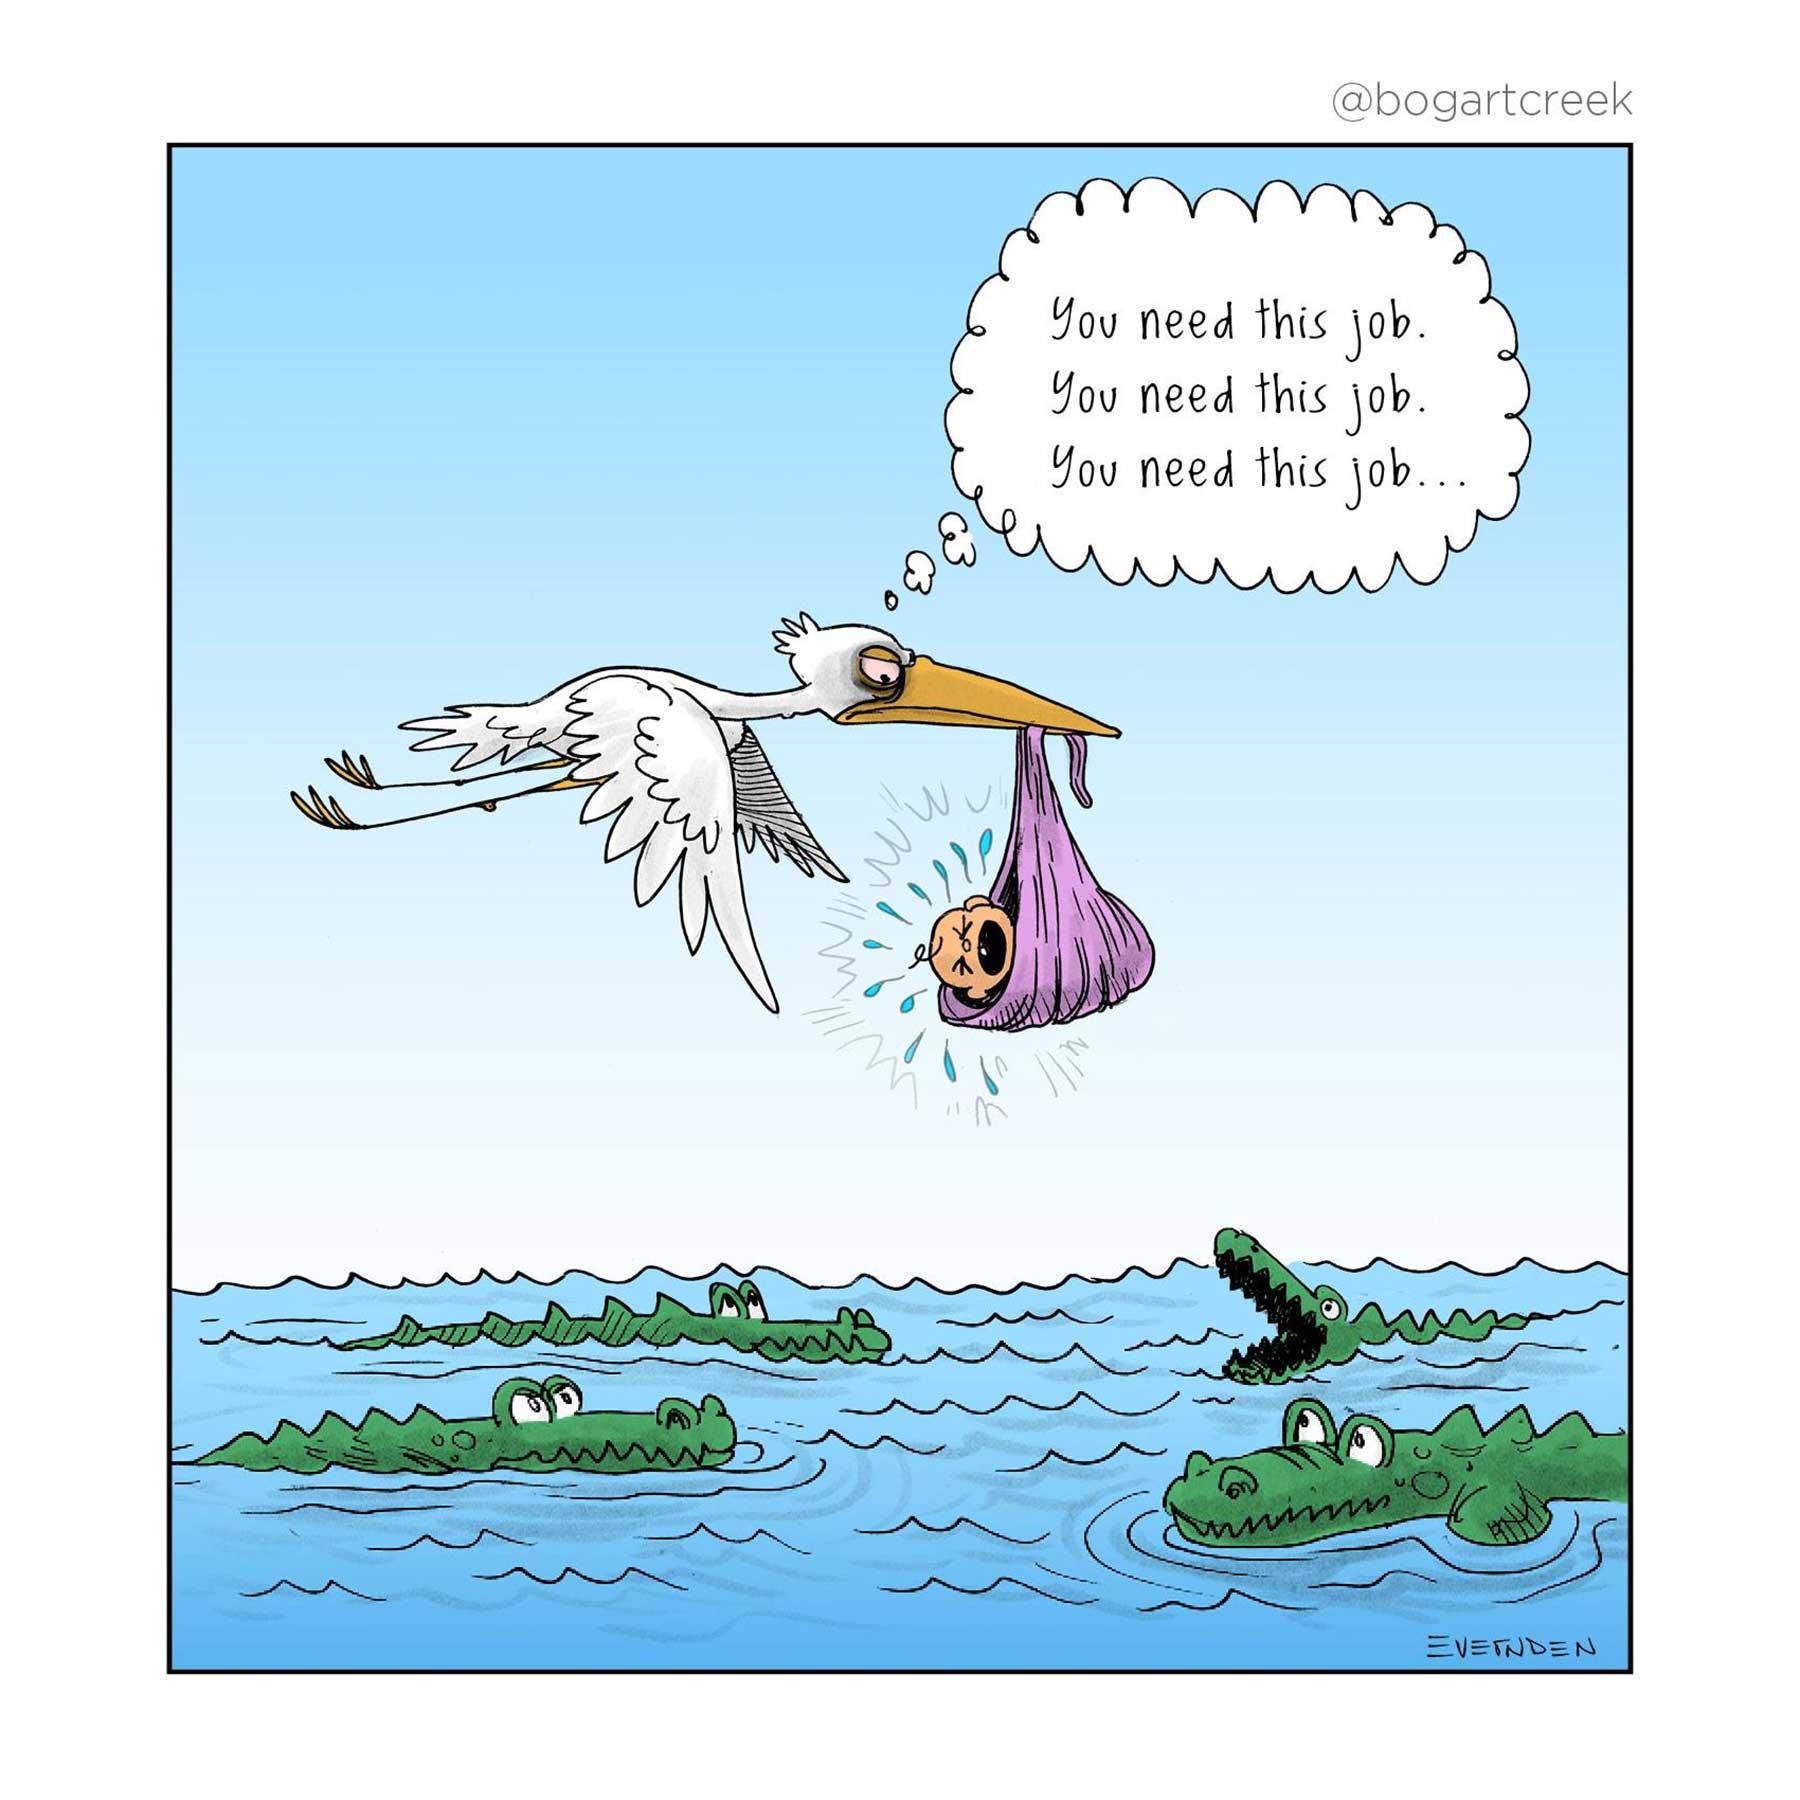 Lustige Single-Panel-Webcomics: Bogart Creek Bogart-Creek-webcomics_10